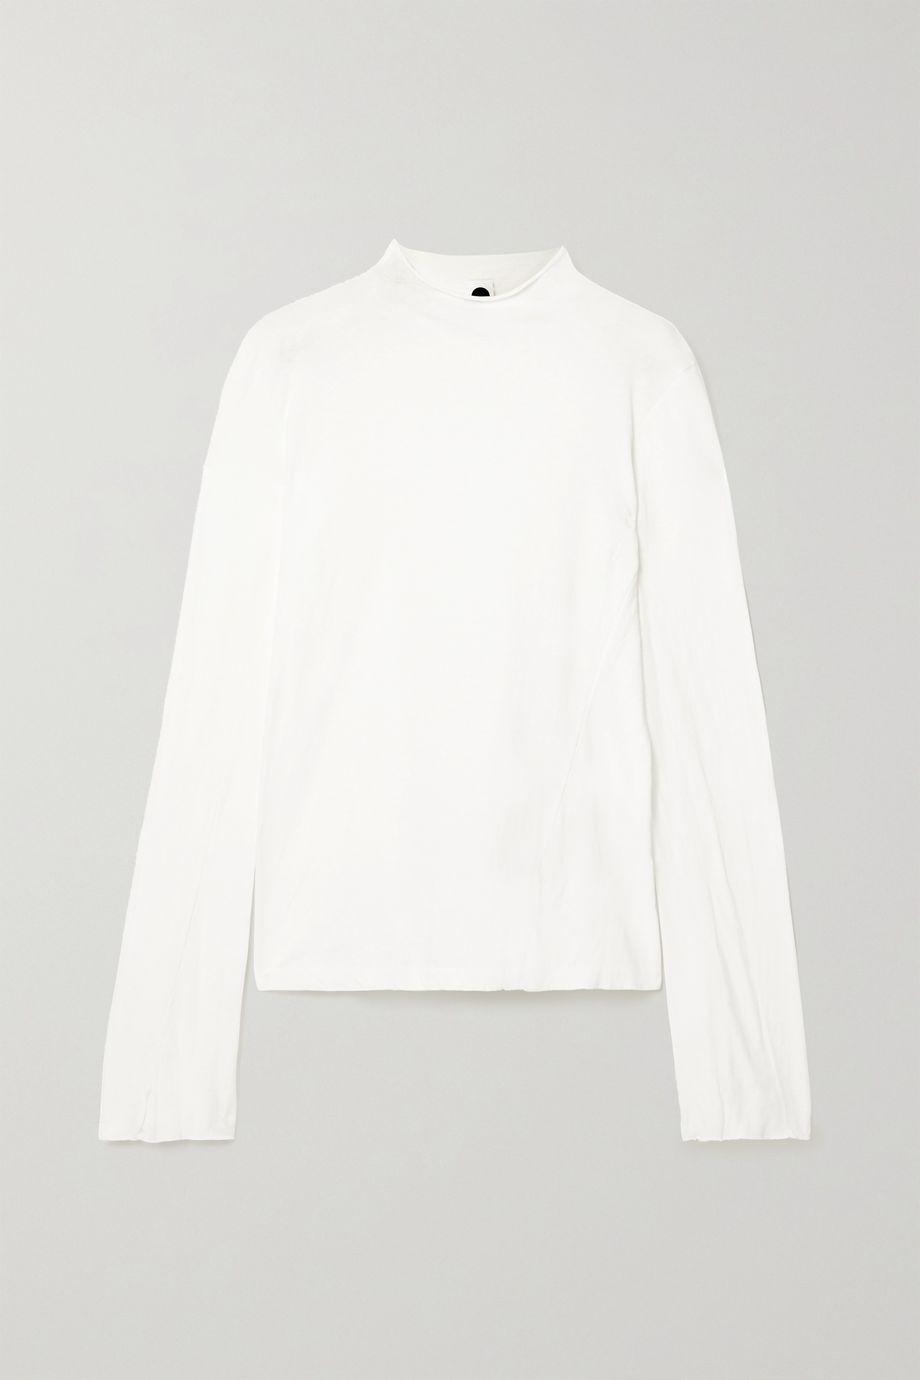 Bassike + NET SUSTAIN organic cotton-jersey top